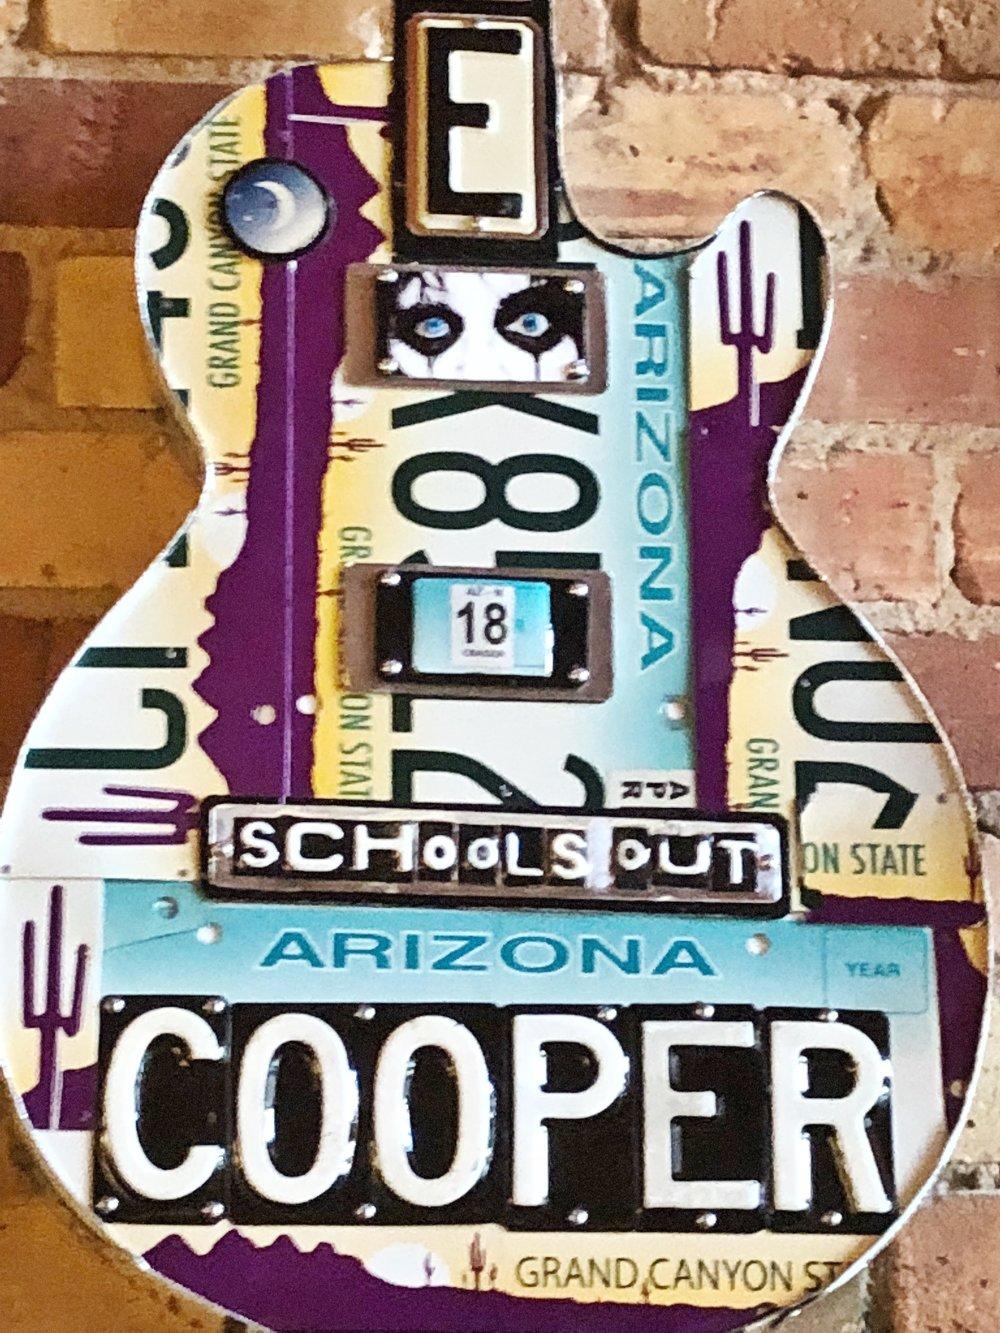 Alice Cooper License Plate Art Rockwell Republic No Flash.JPG